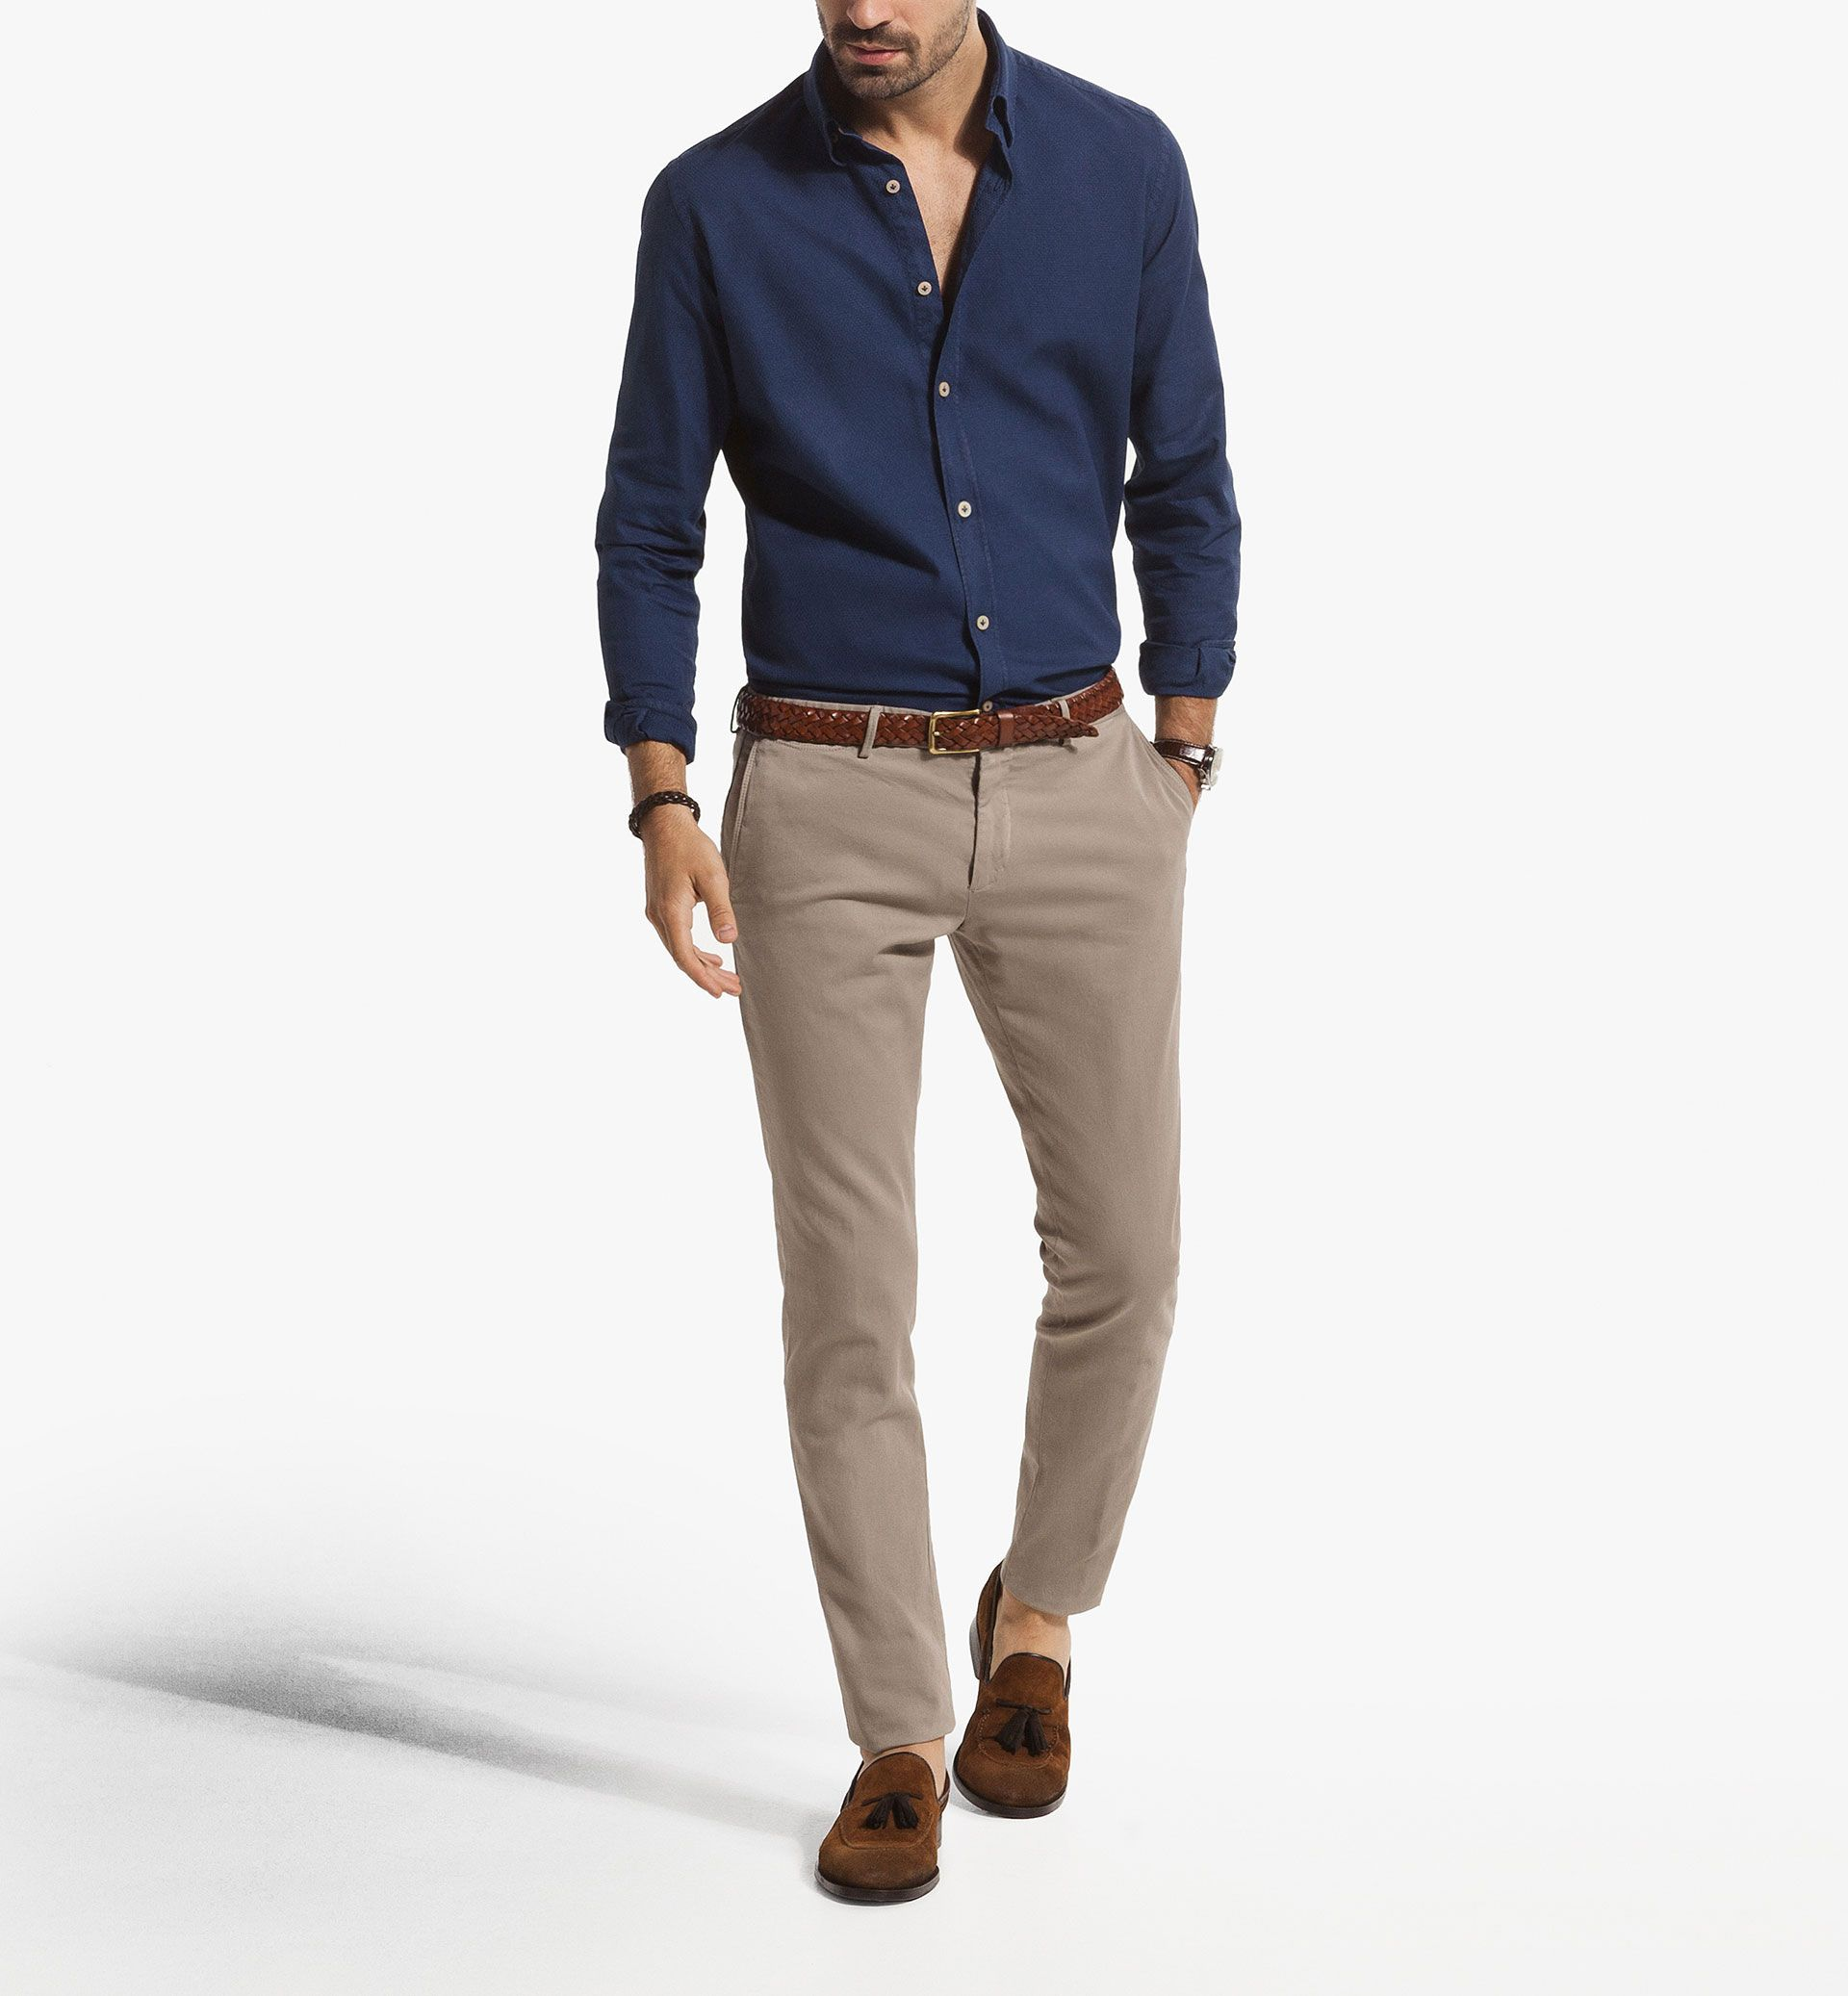 Pantalon beige MD chemise bleue   kamal   Pinterest ...